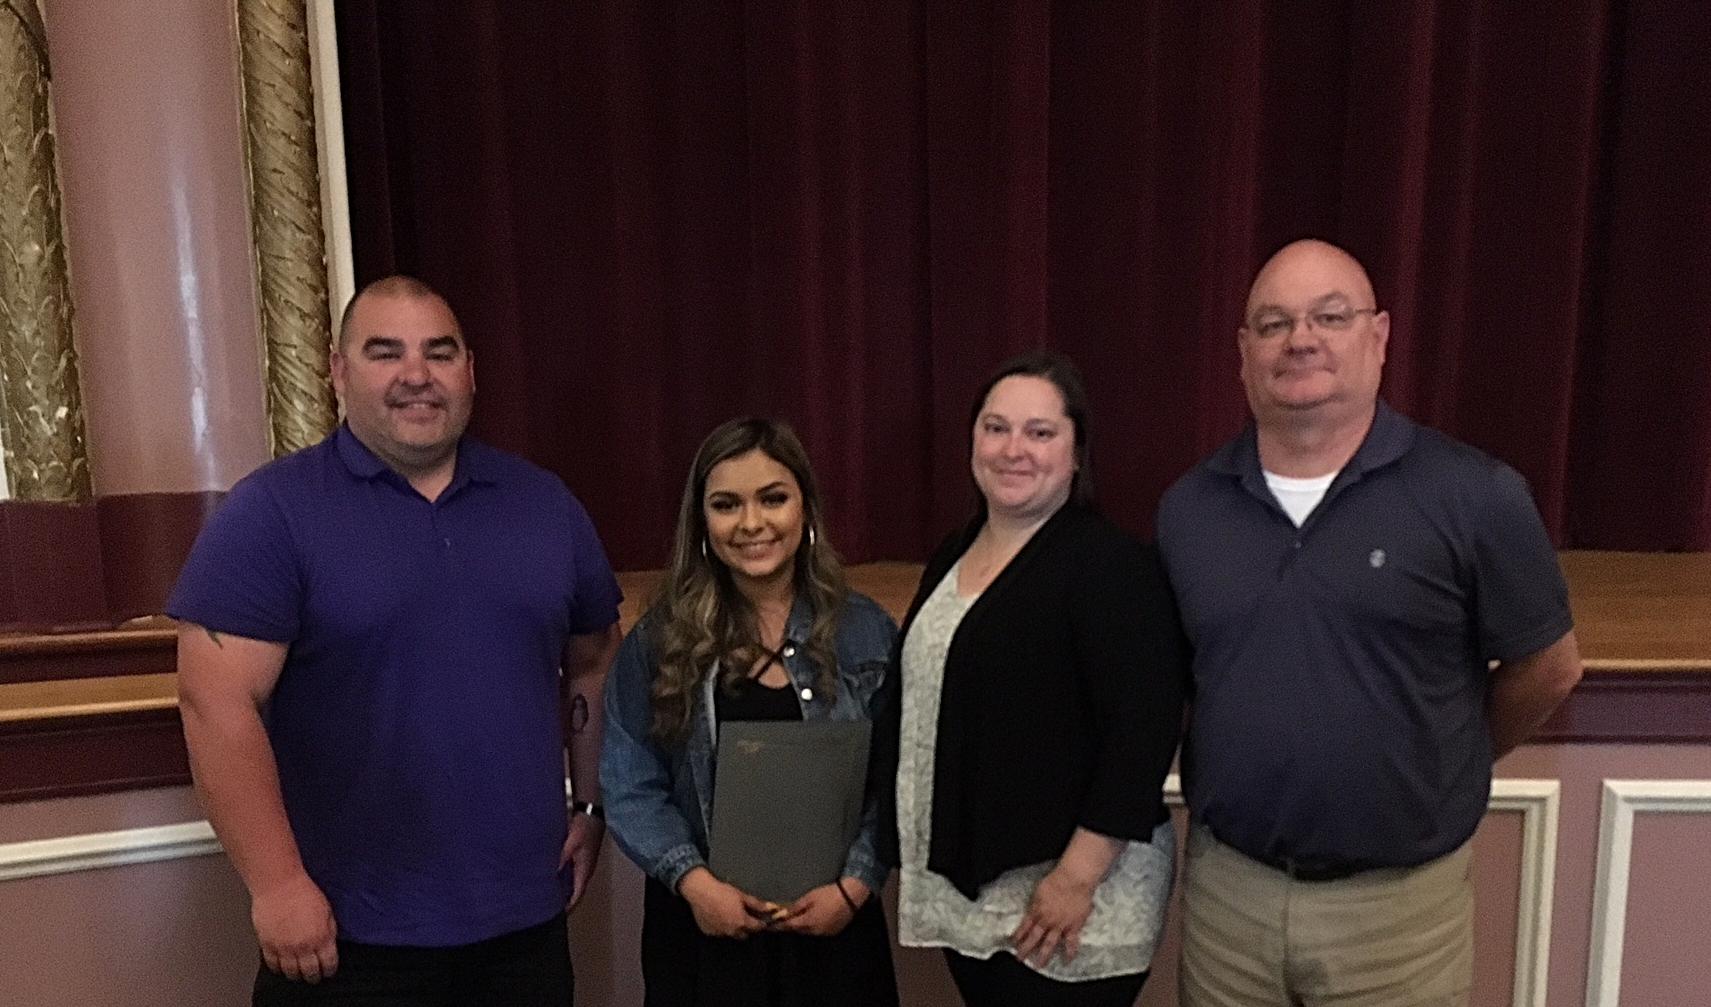 Ray Brassard, Melissa Borrayo Garcia (2018 Puyallup HS Scholarship recipient), Melissa Brassard, and Tracy Cutler